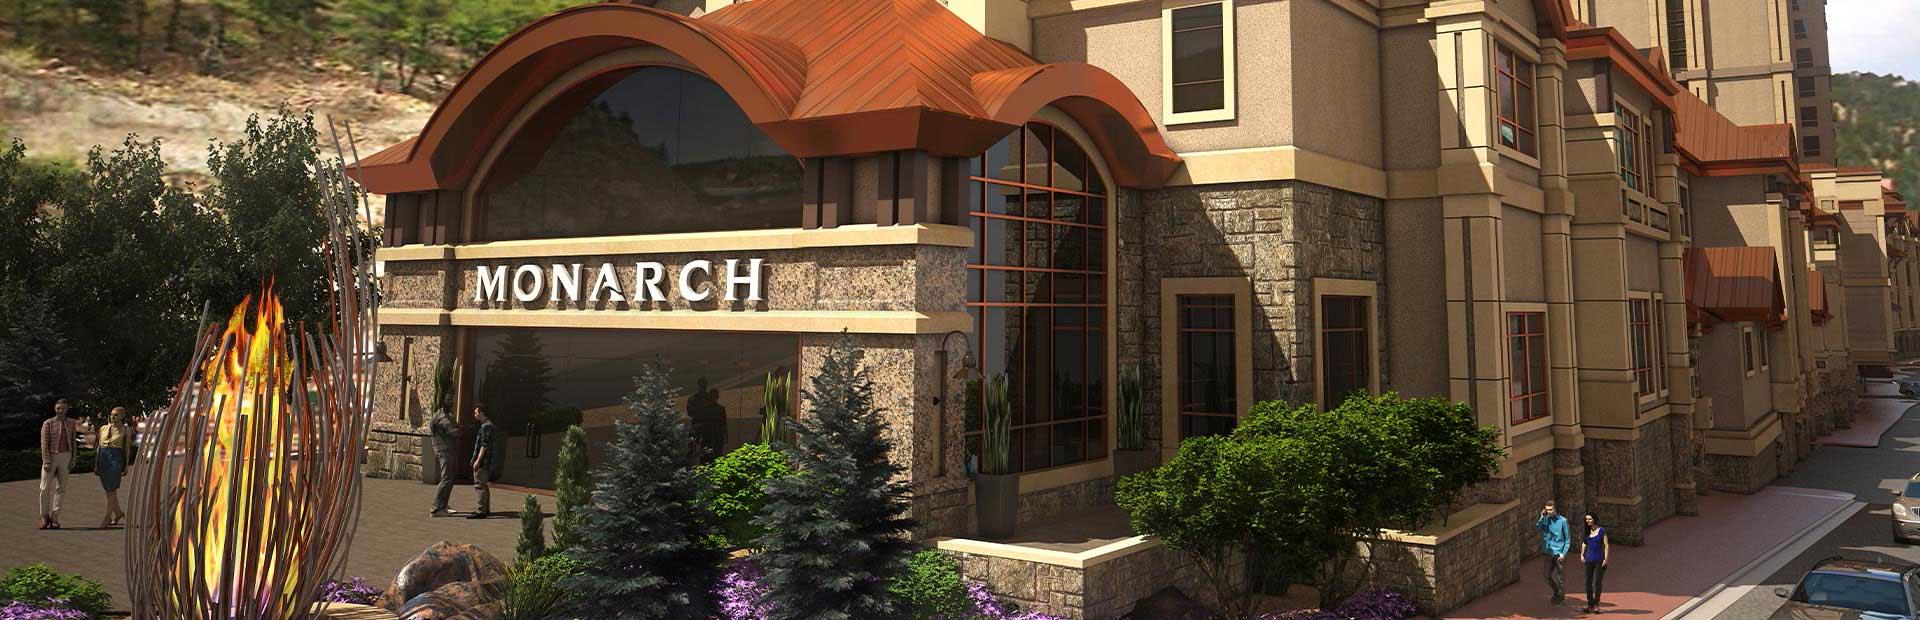 Monarch Casino Resort Spa Exterior